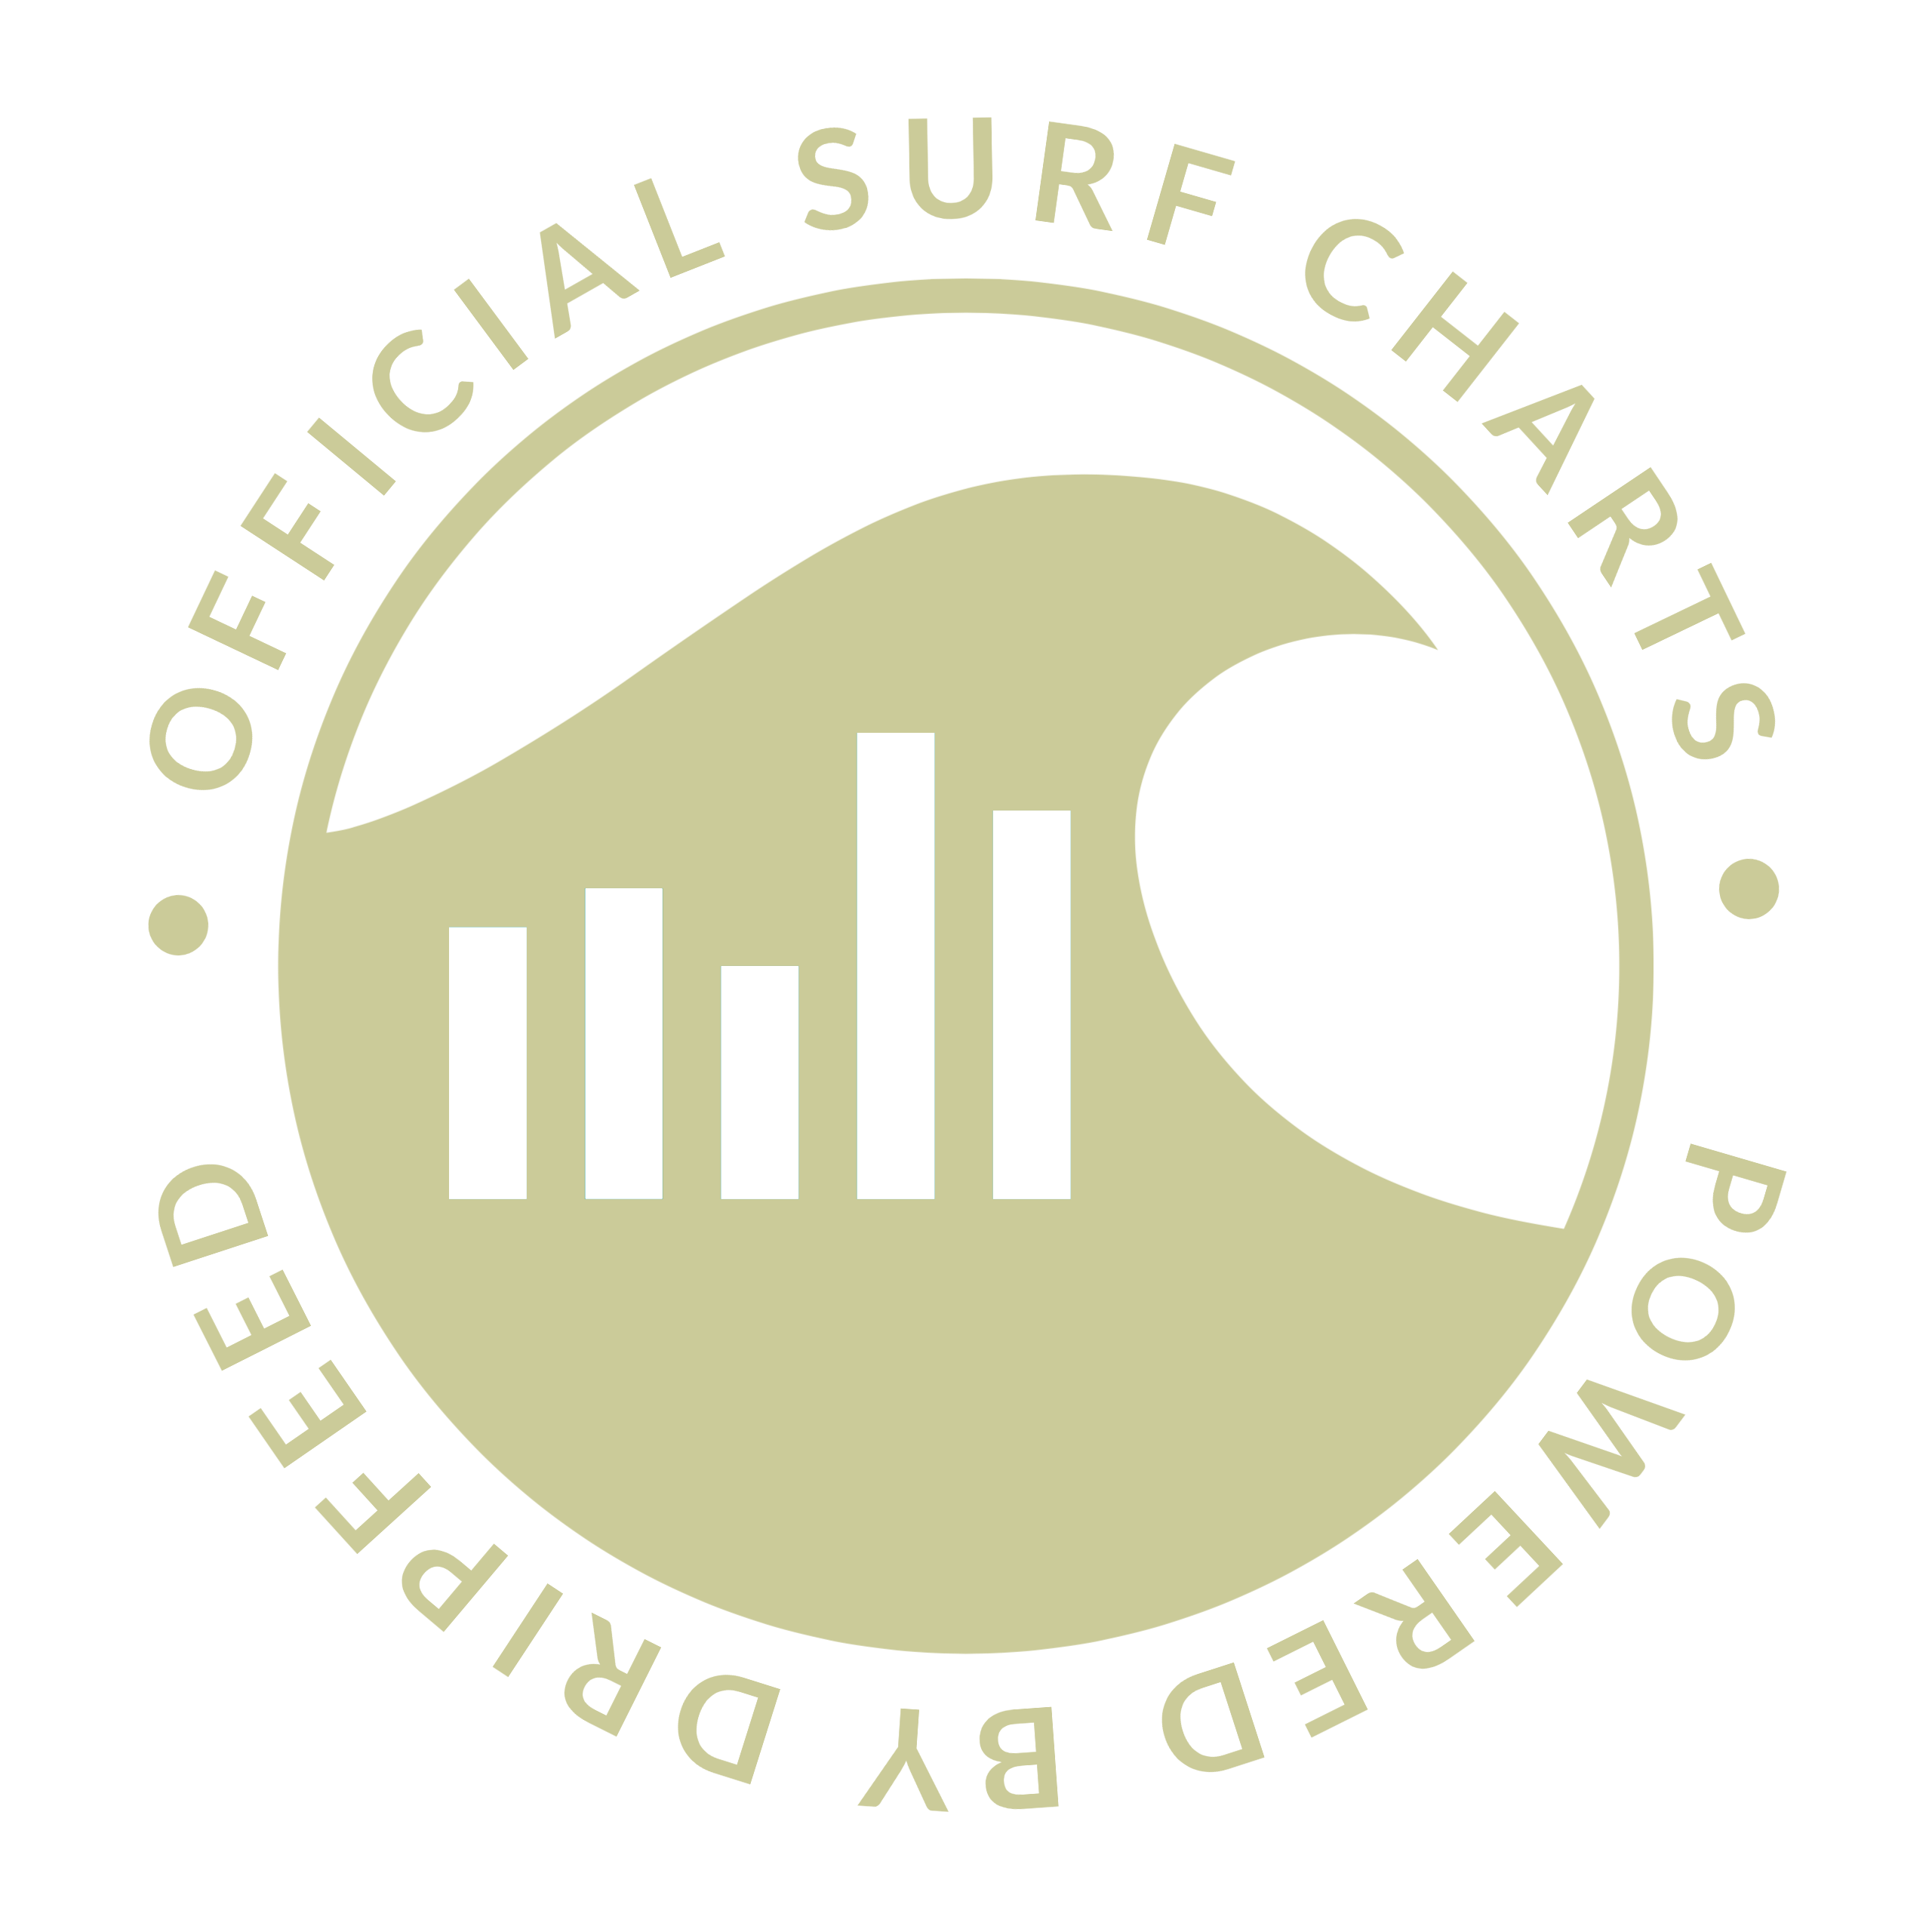 OfficialSurfCharts-logo1 OFFICIAL SURF CHARTS